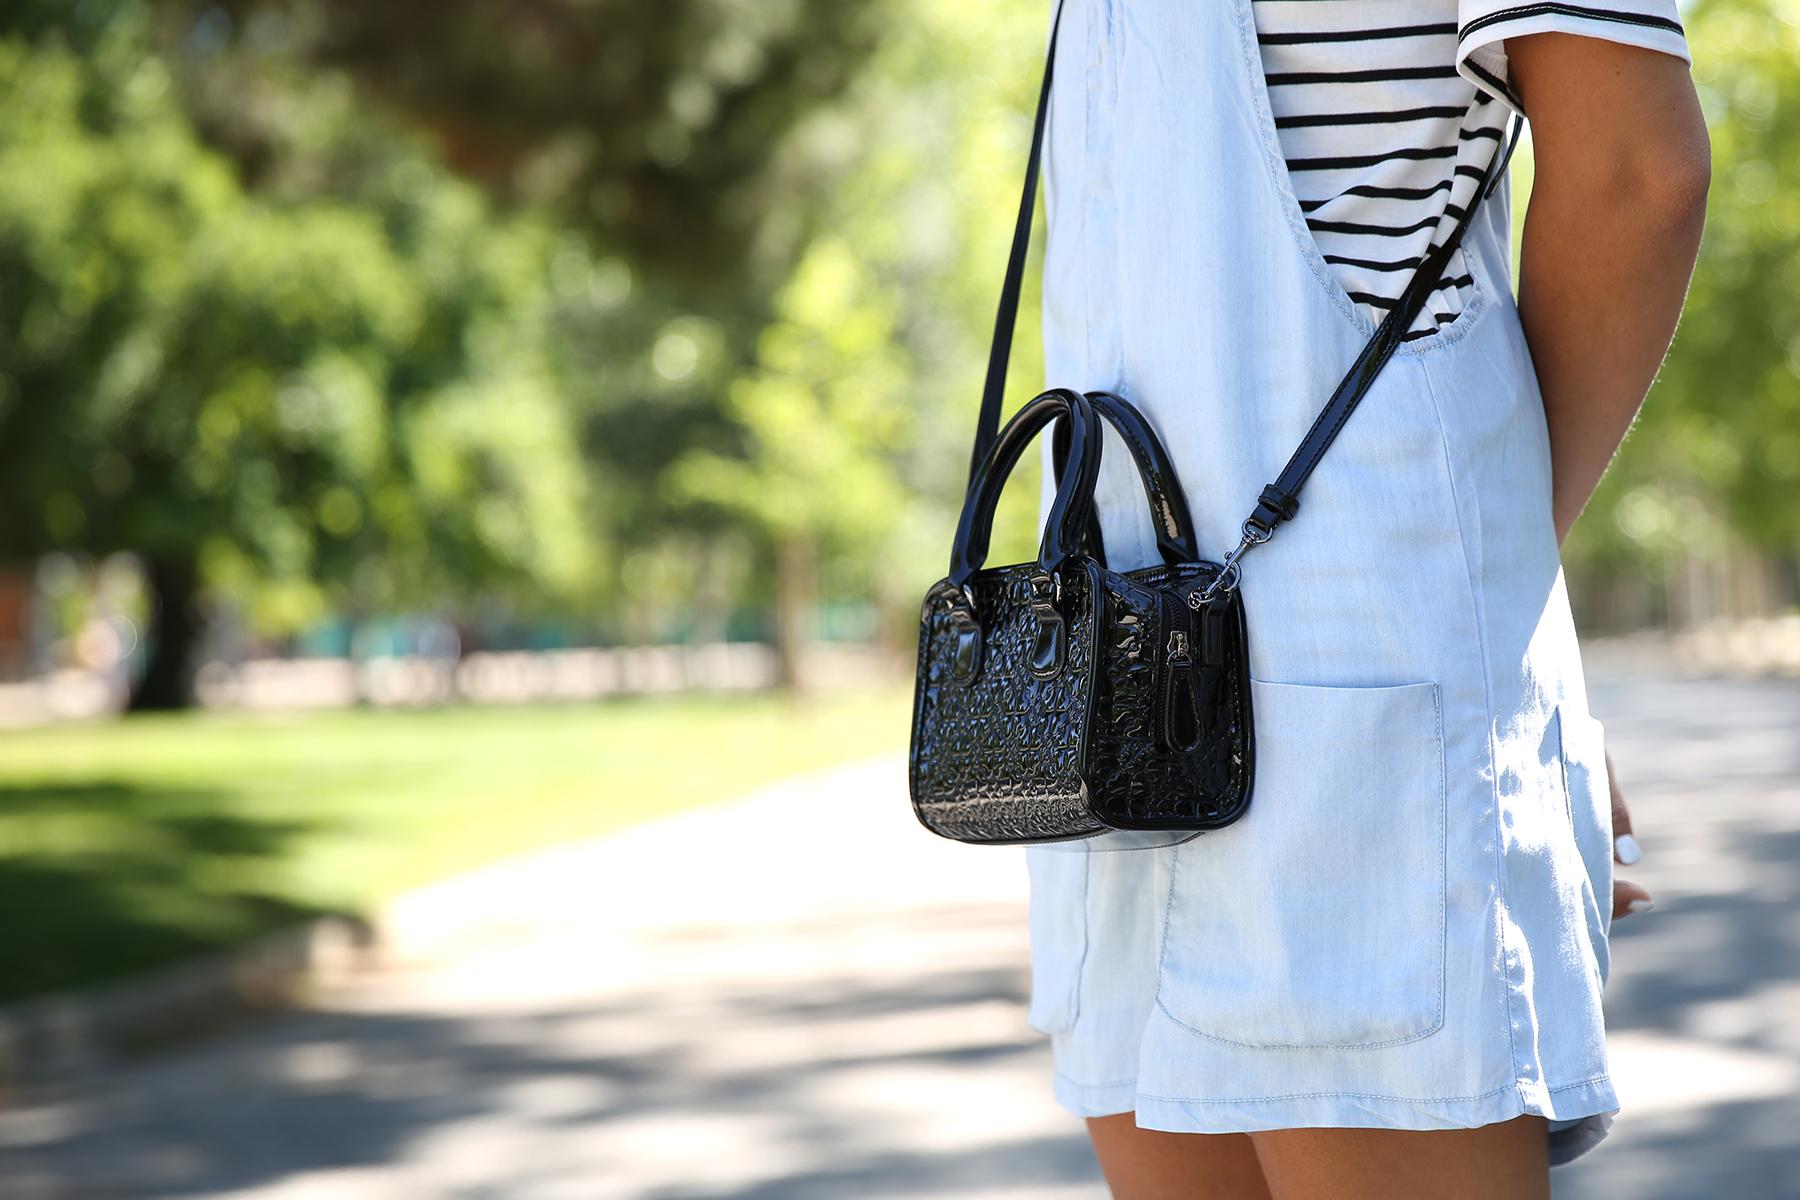 trendy_taste-look-outfit-street_style-ootd-blog-blogger-fashion_spain-vaquero_claro-peto_vaquero-tirantes-striped_tee-camiseta_rayas-marinero-dior_sunnies-gaimo-4